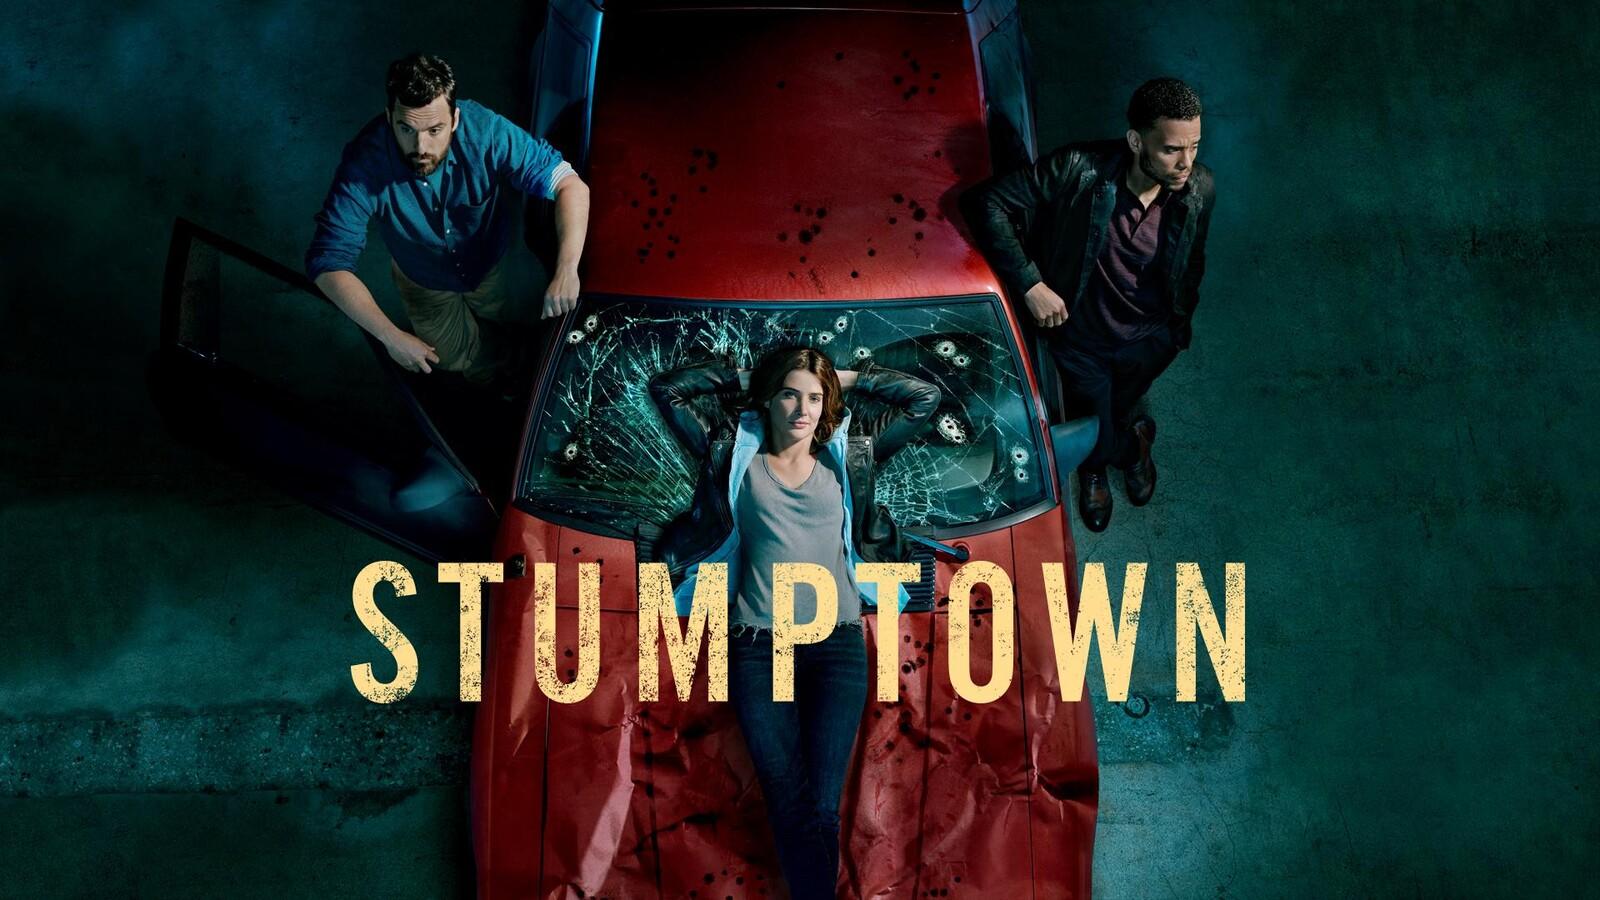 Stumptown Season 2 update